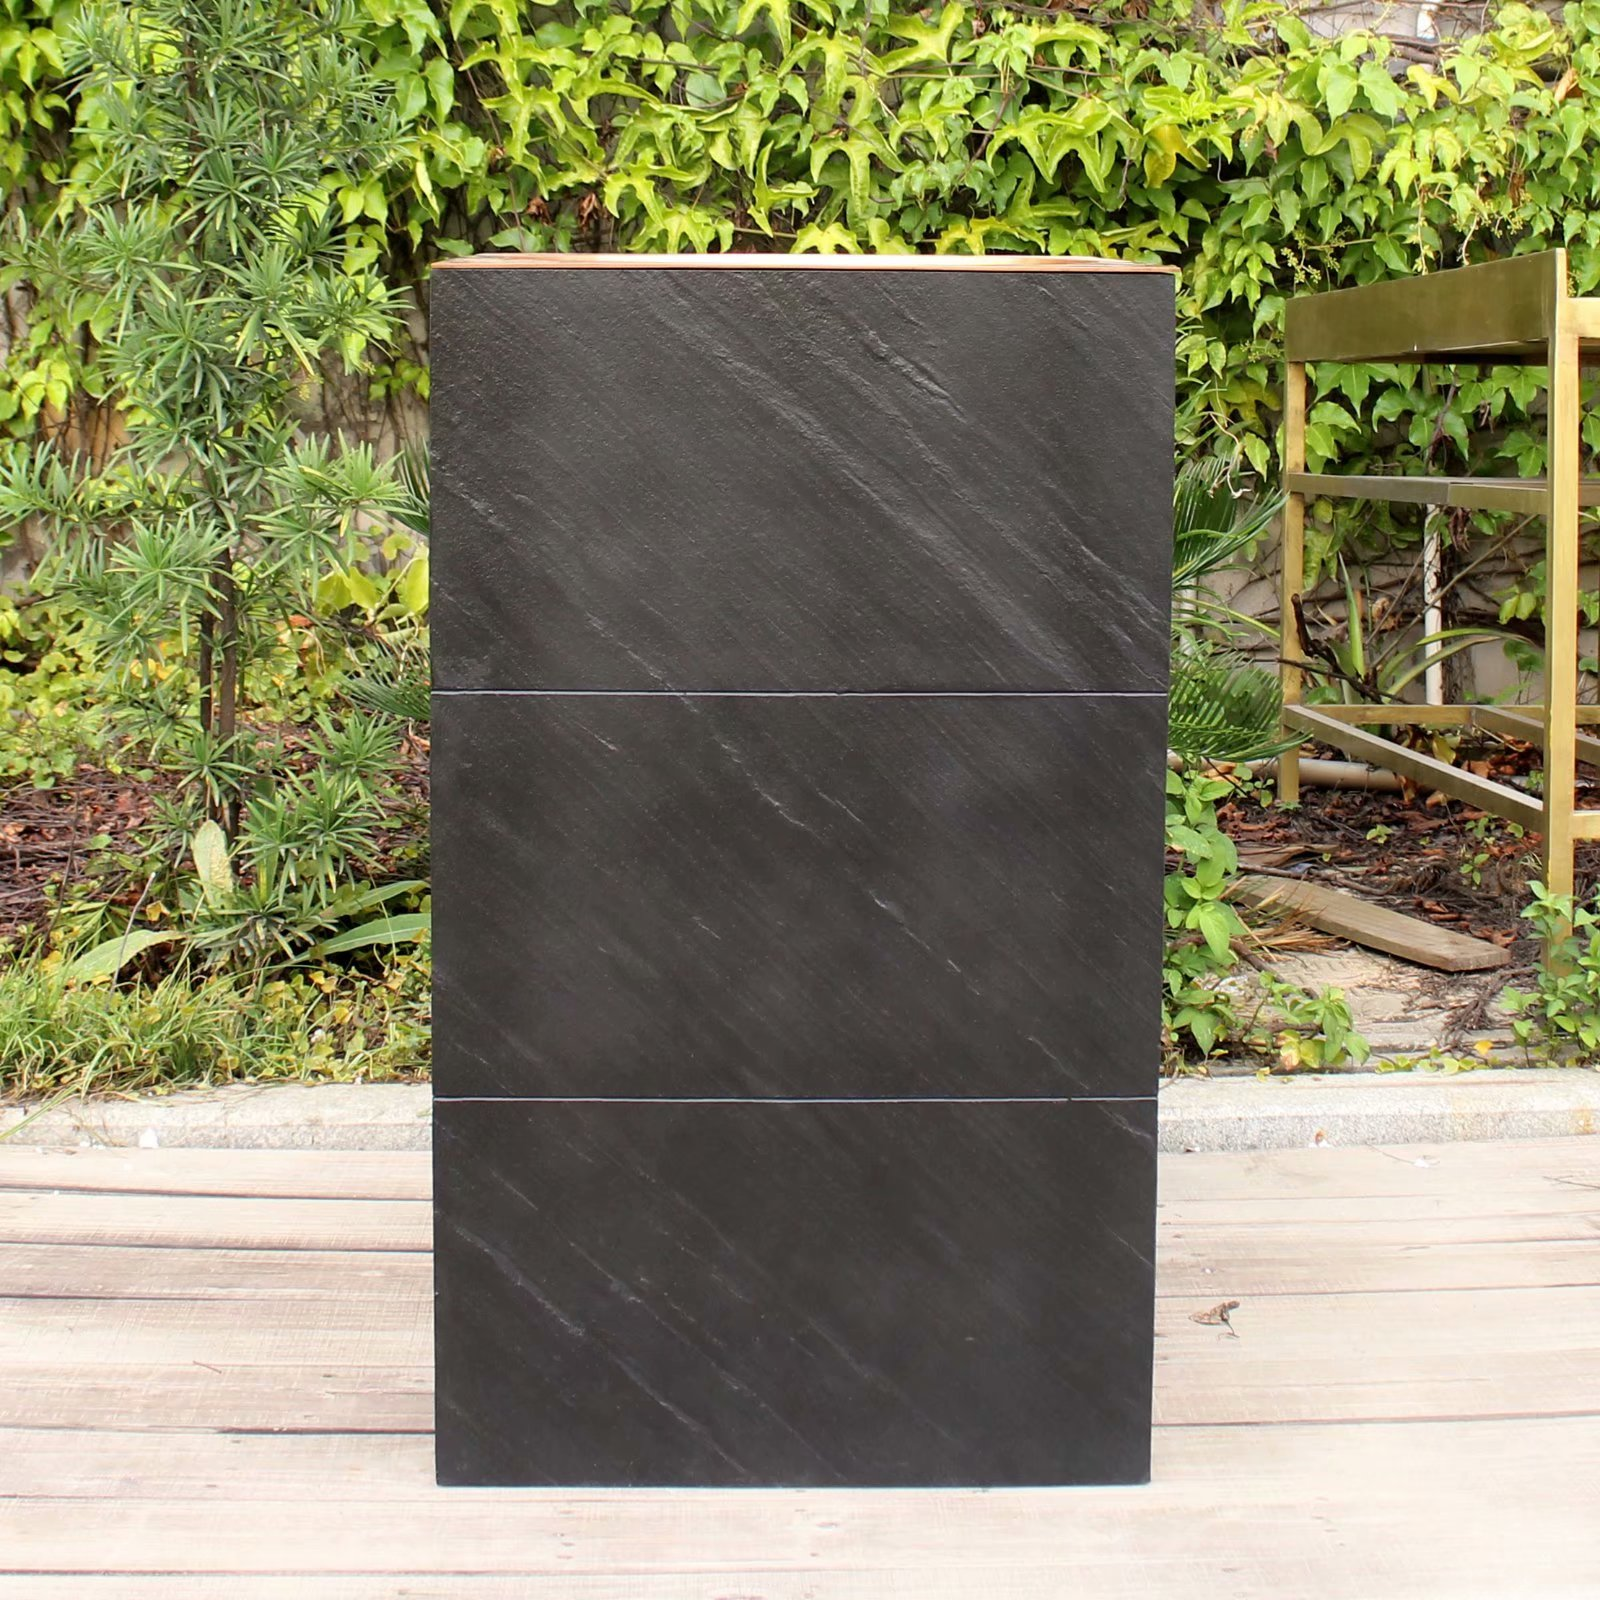 Lavabo de pilar de cobre de estilo europeo, pilar integrado, tabla de...